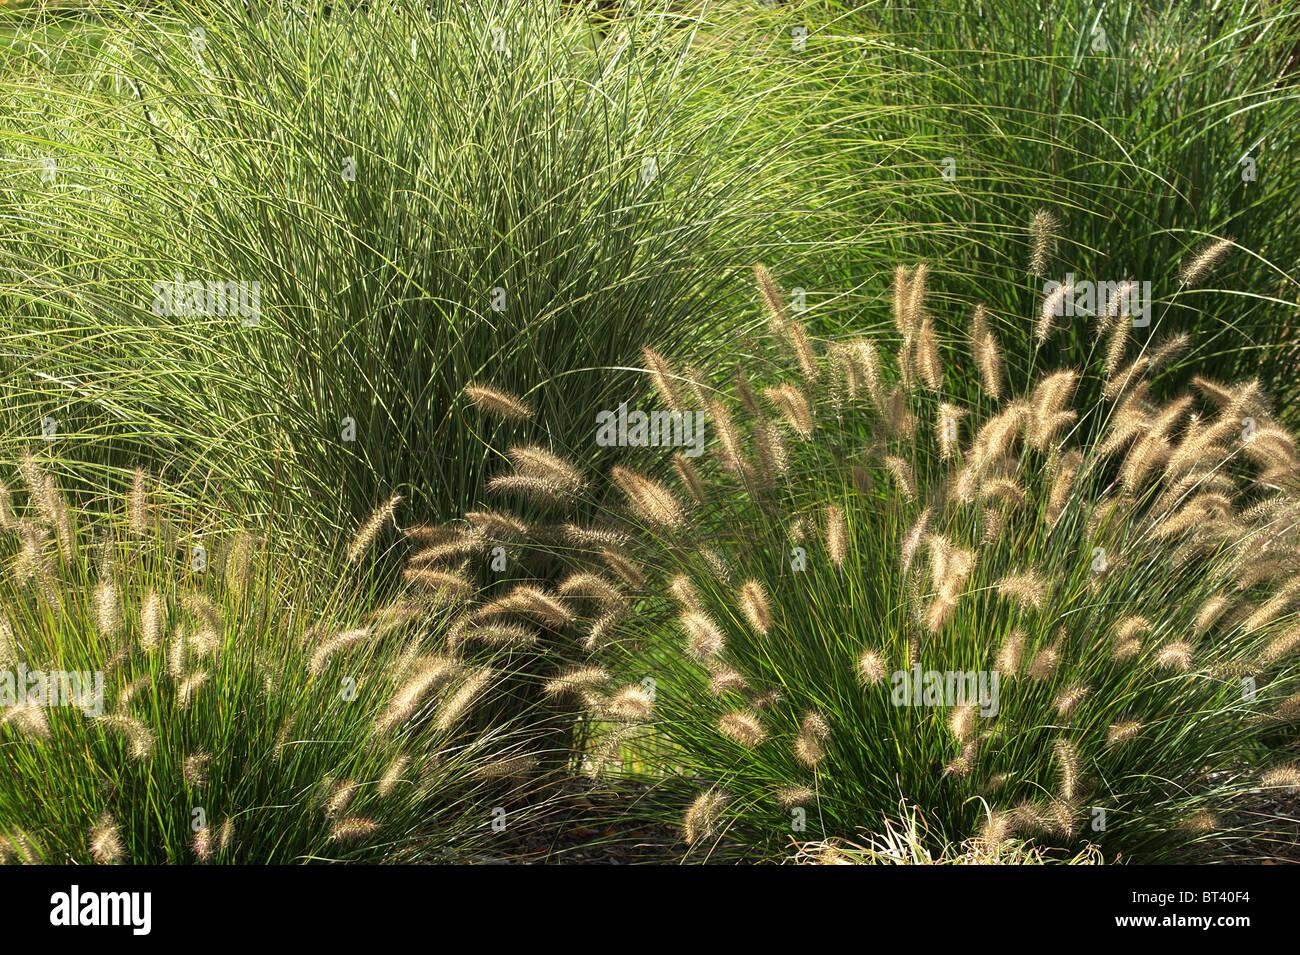 Ornamental grasses in garden stock photo royalty free for Different ornamental grasses